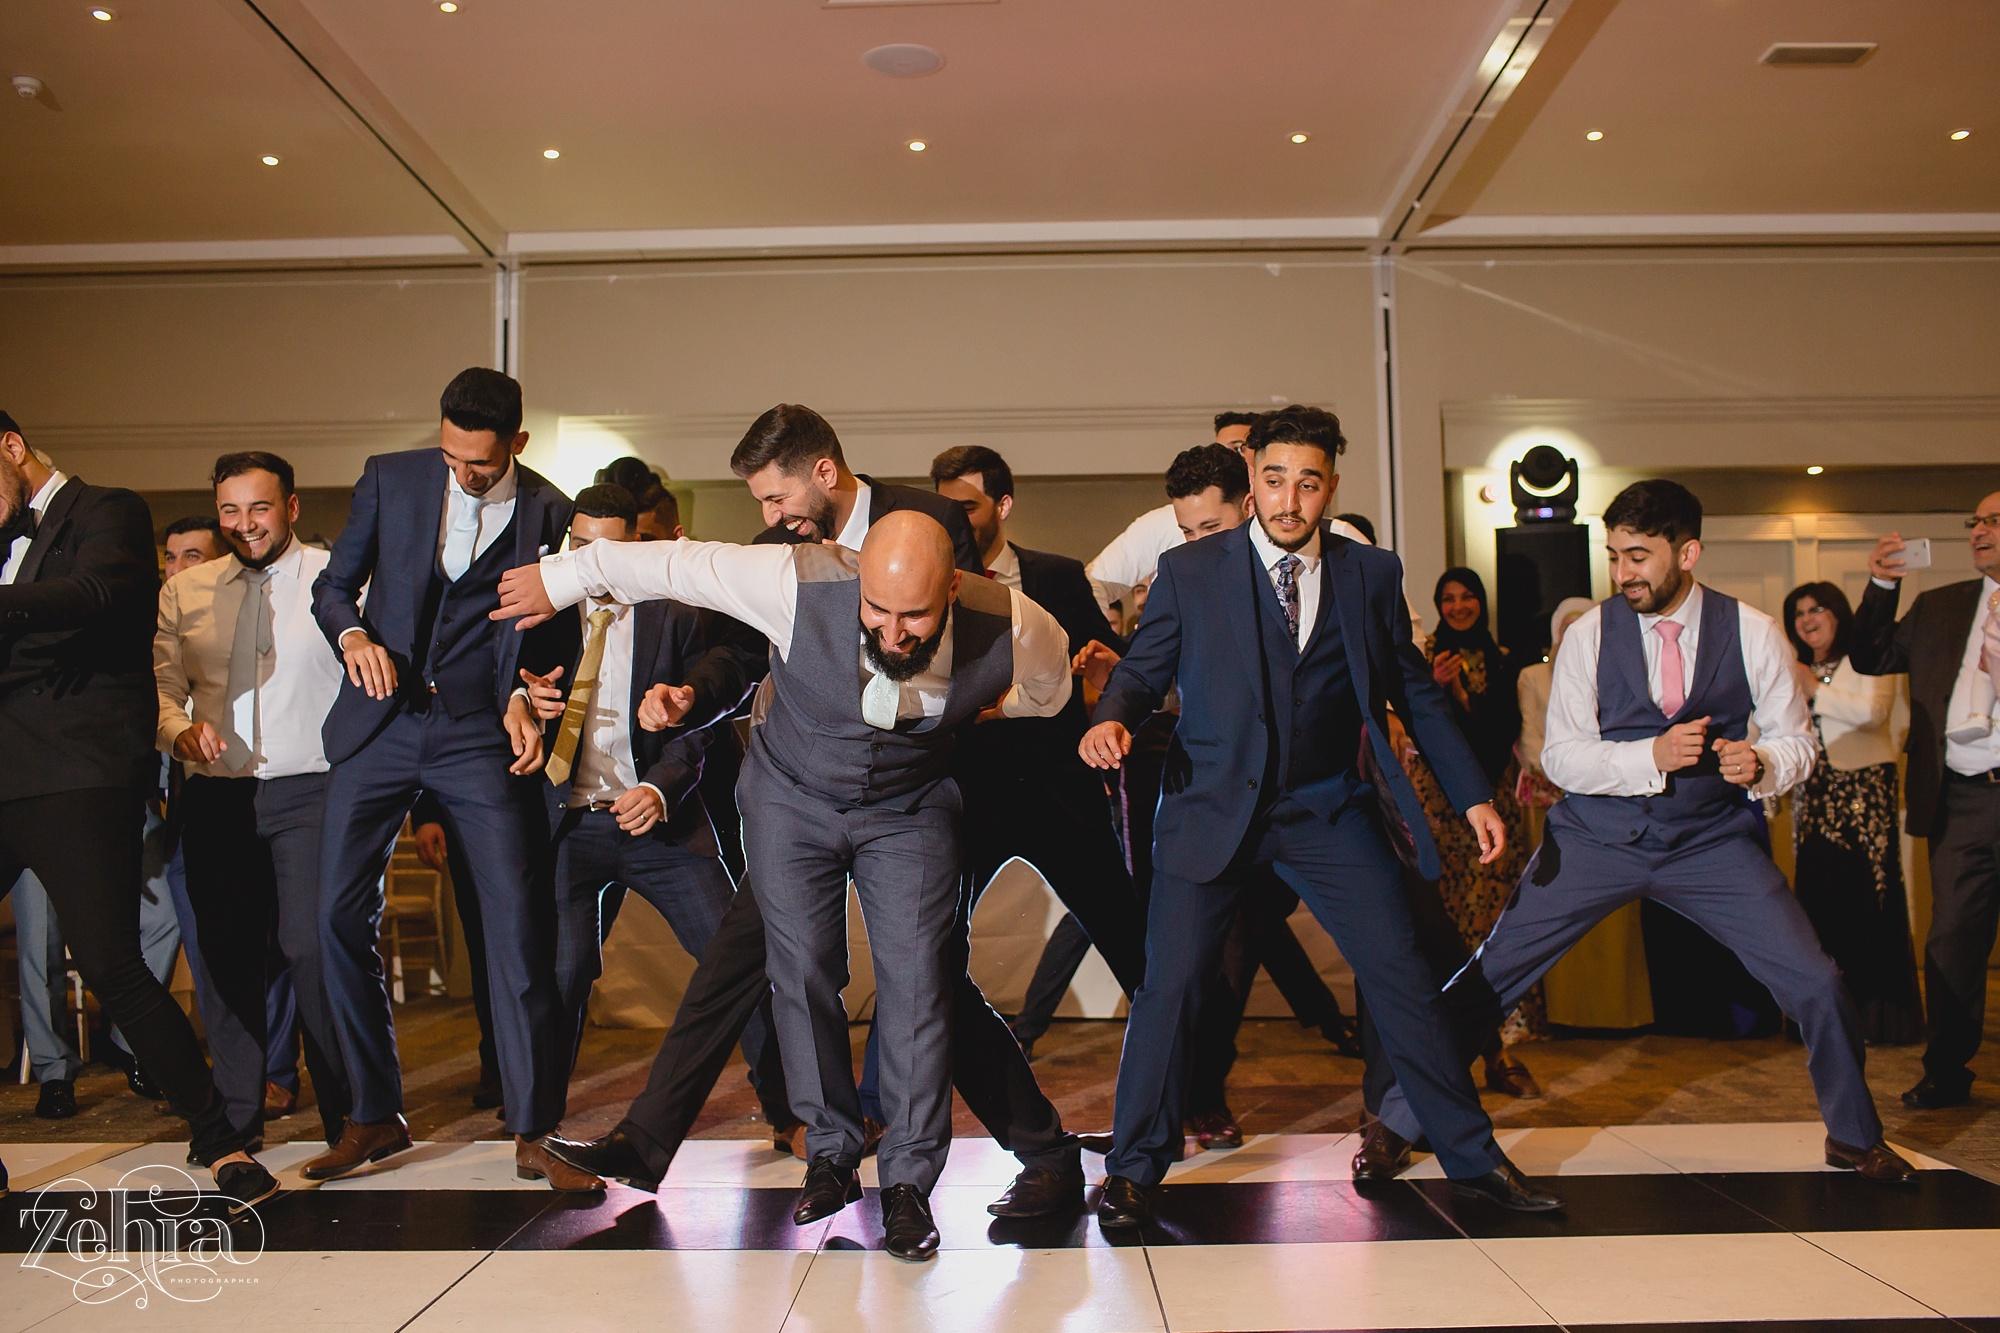 zehra photographer mere cheshire wedding_0062.jpg